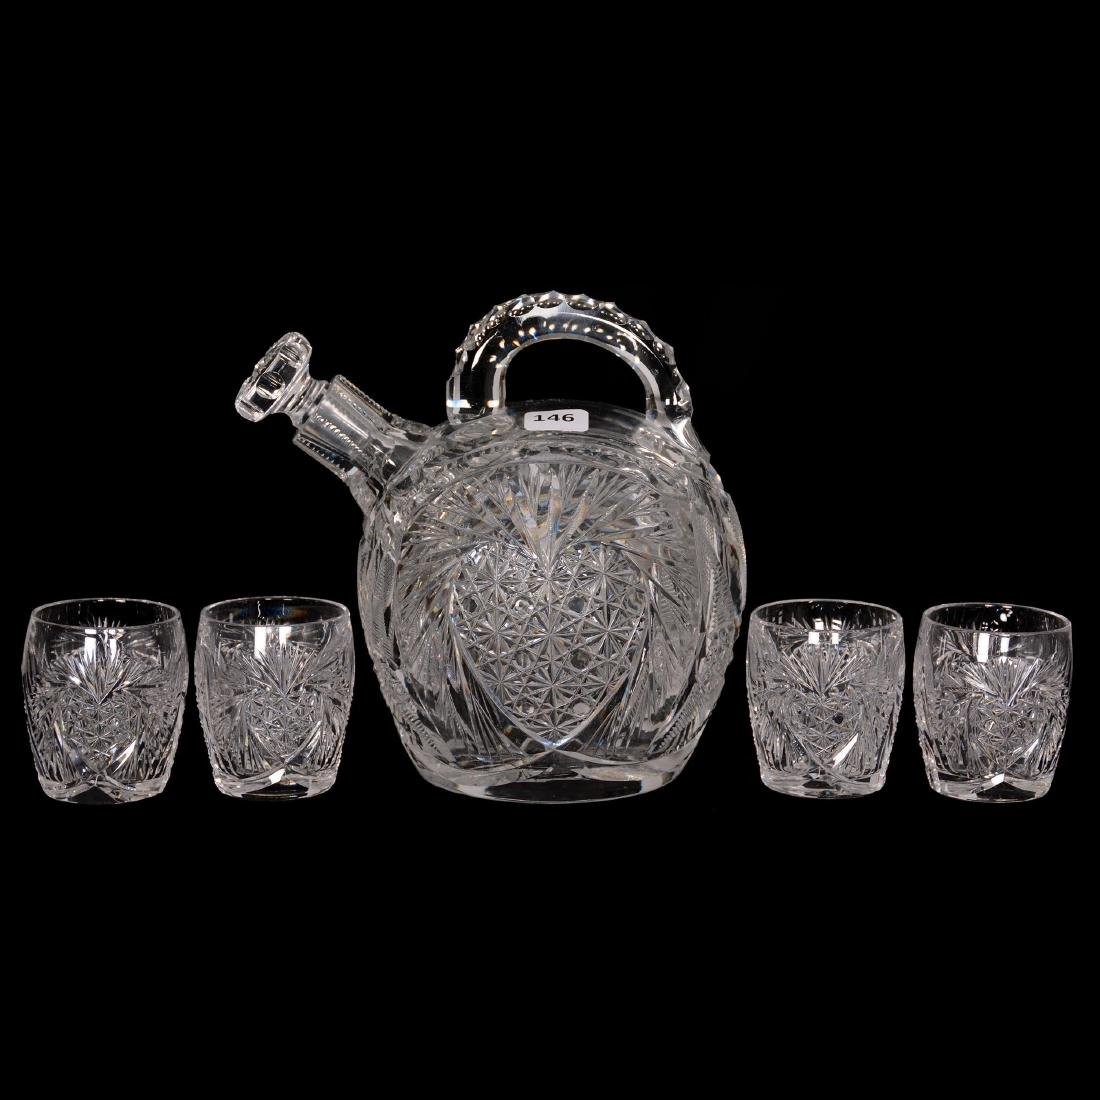 Rum Jug and (4) Shot Glasses - ABCG